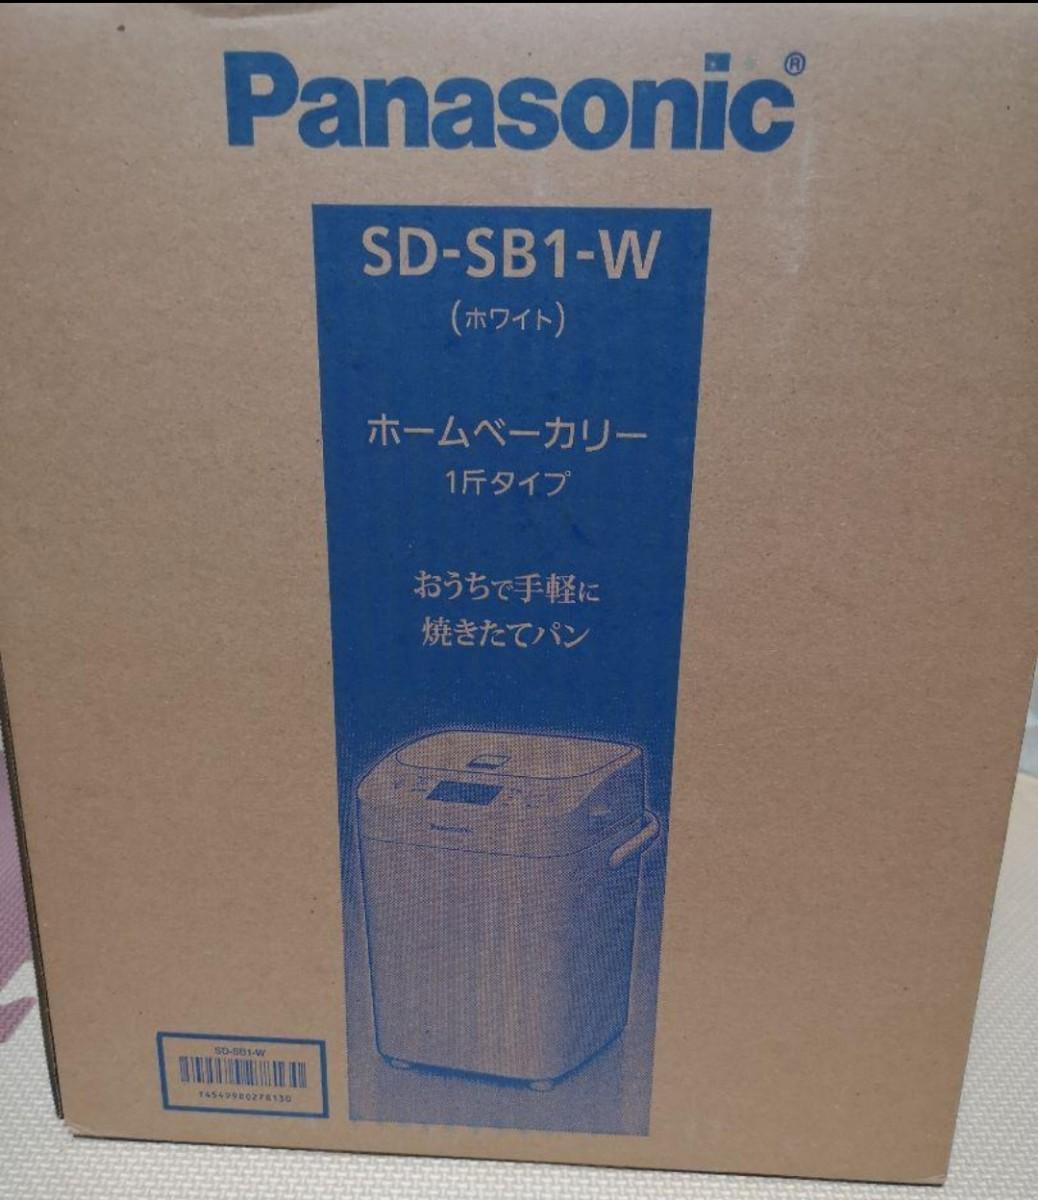 Panasonic SD-SB1-Wホームベーカリー